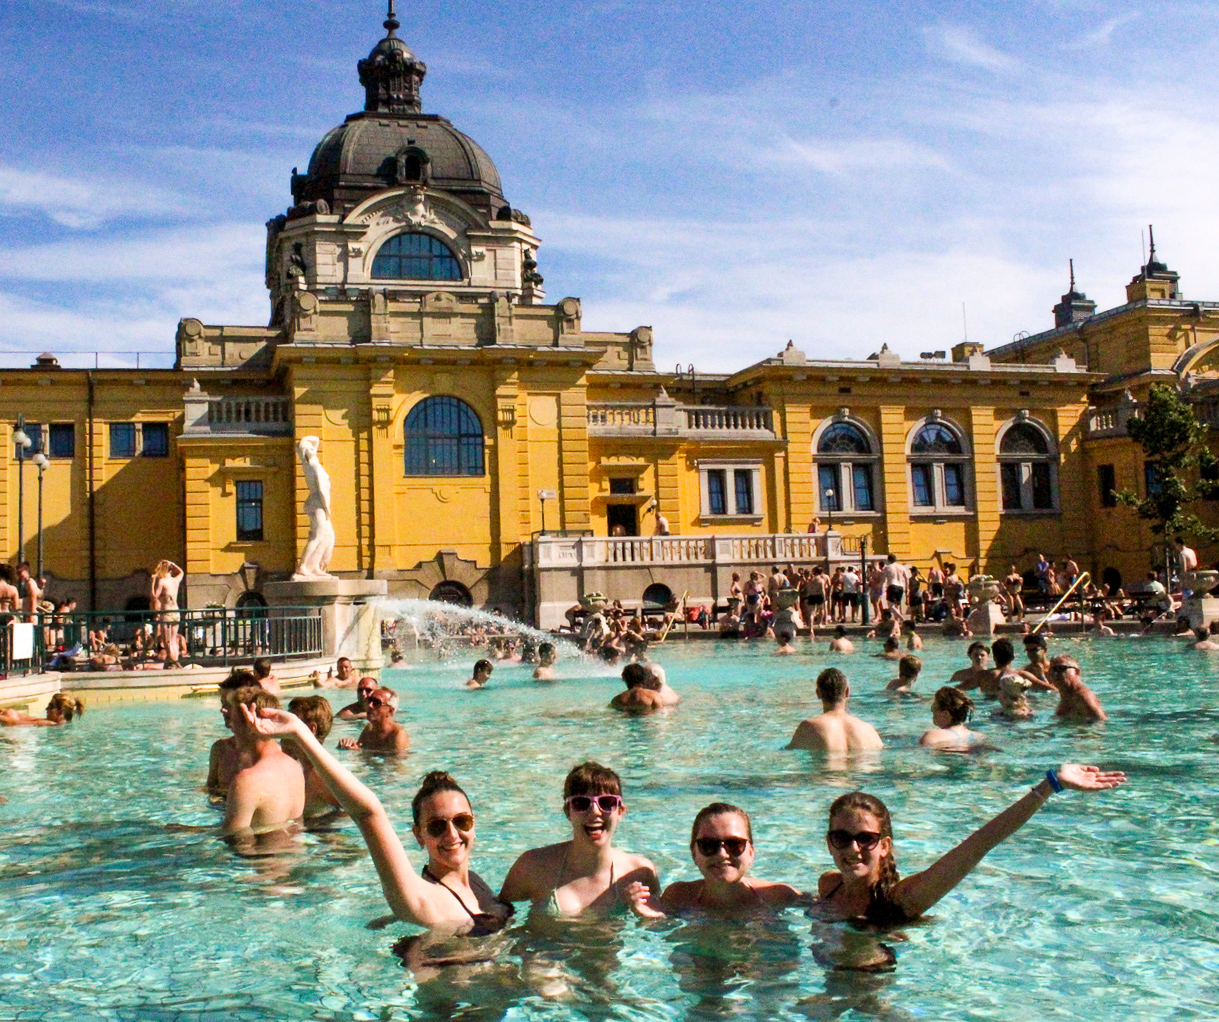 Summer Program - Group Travel | Travel For Teens: Europe for Older Teens - Berlin, Krakow, Vienna and Budapest